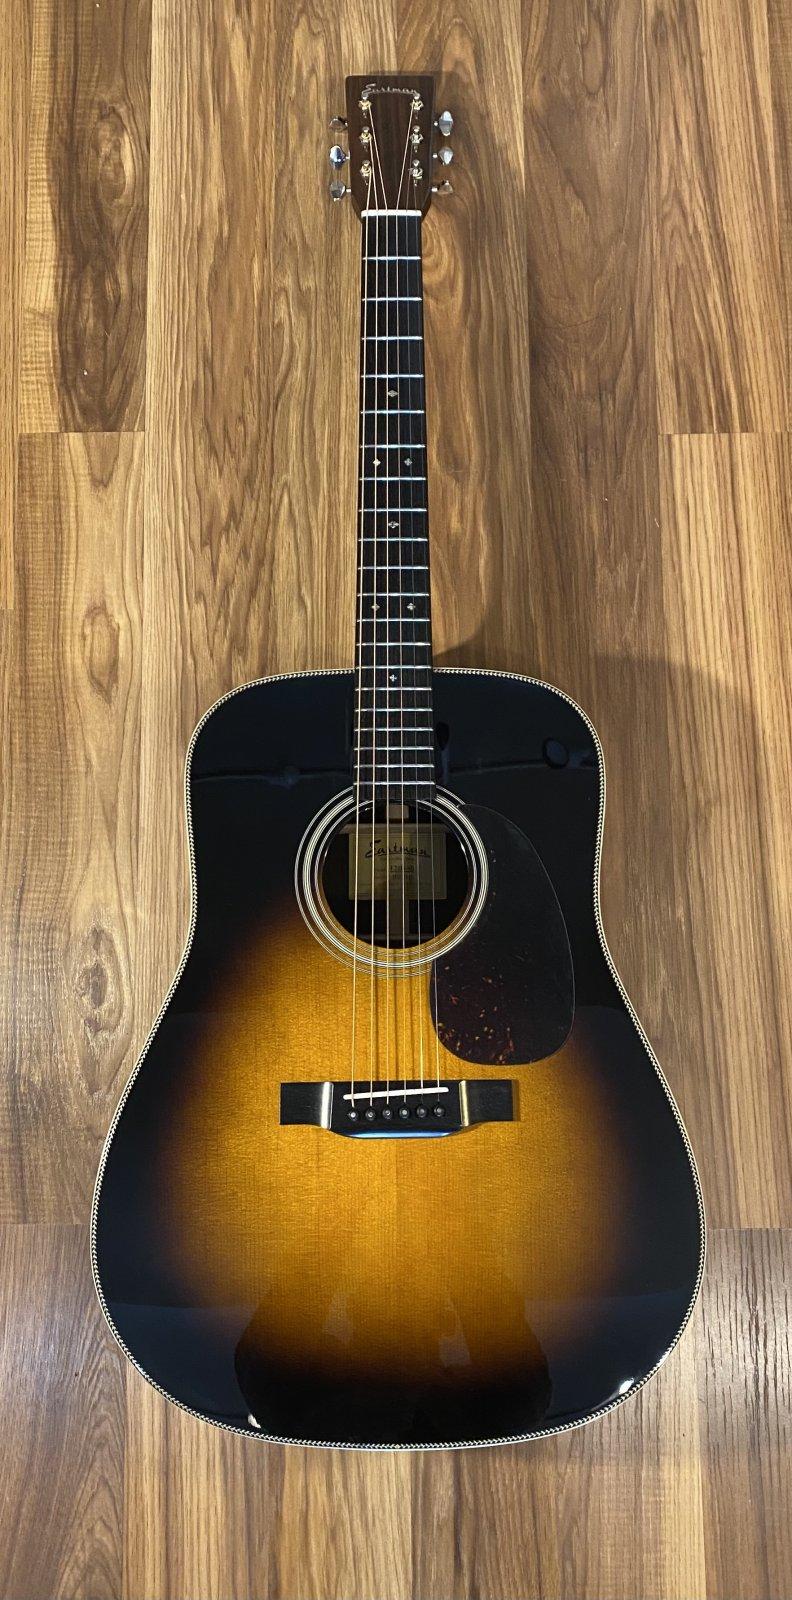 Eastman E20D SB Sunburst Dreadnaught Acoustic Guitar